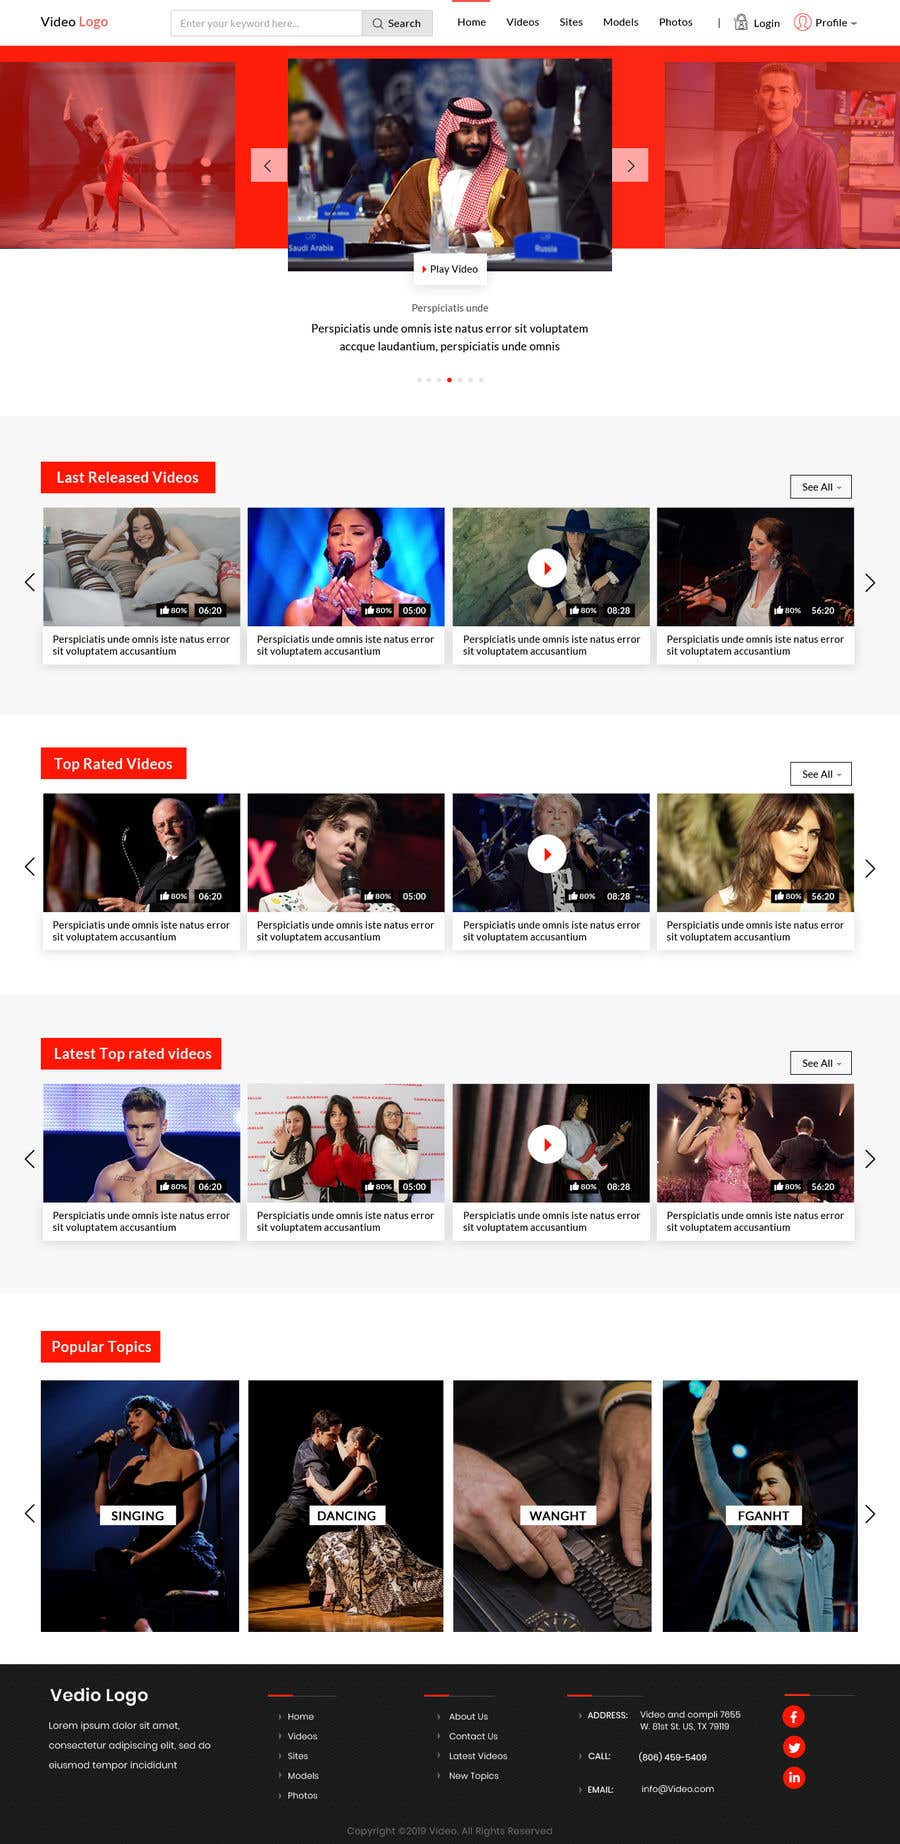 Penyertaan Peraduan #51 untuk Design landing page for the memberzone of a subscription only video website